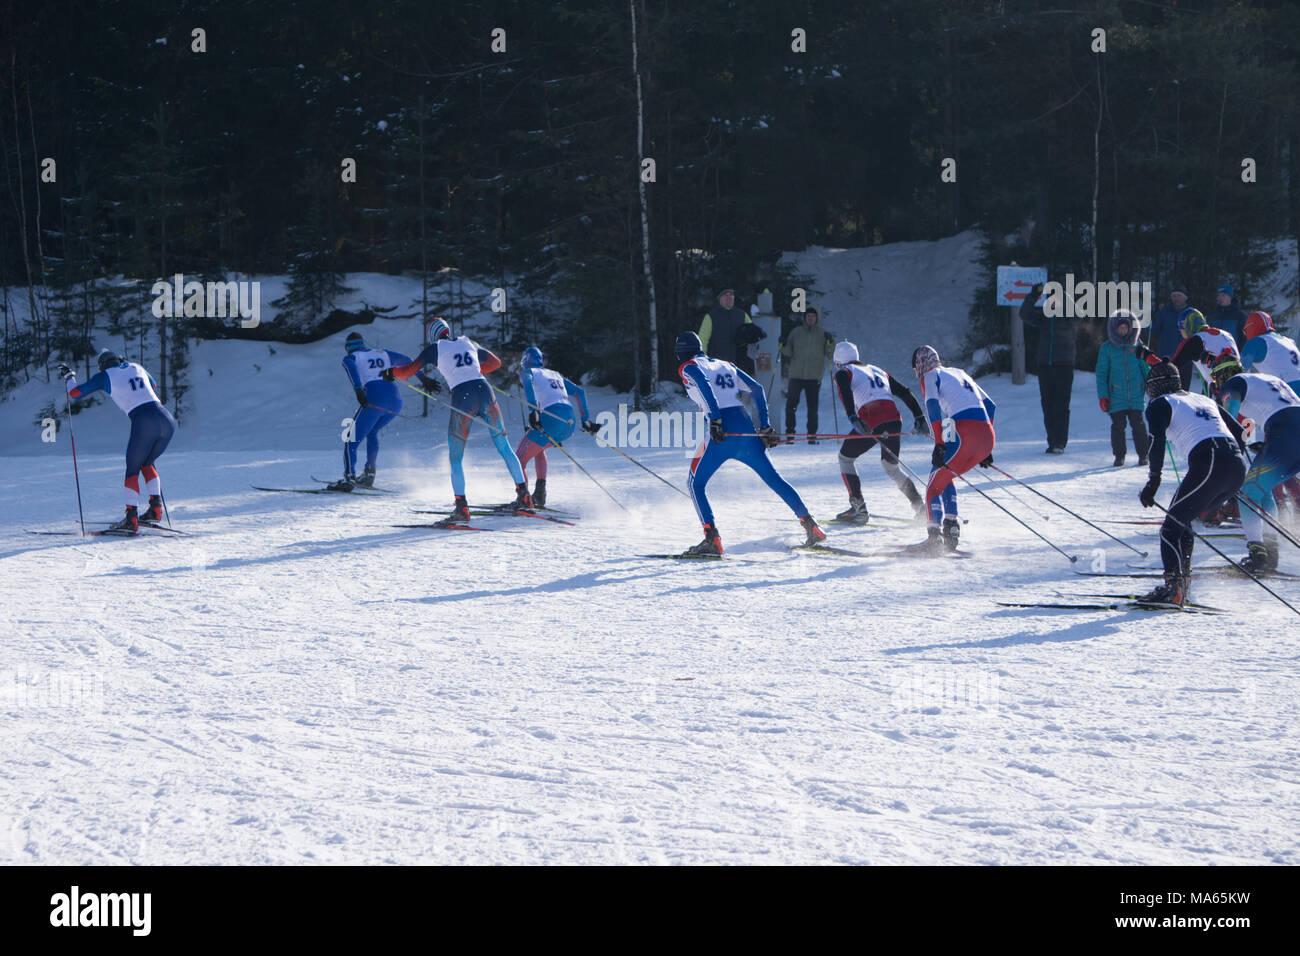 Championship ski marathon in where men skiing at a distance of 70 kilometers - Stock Image